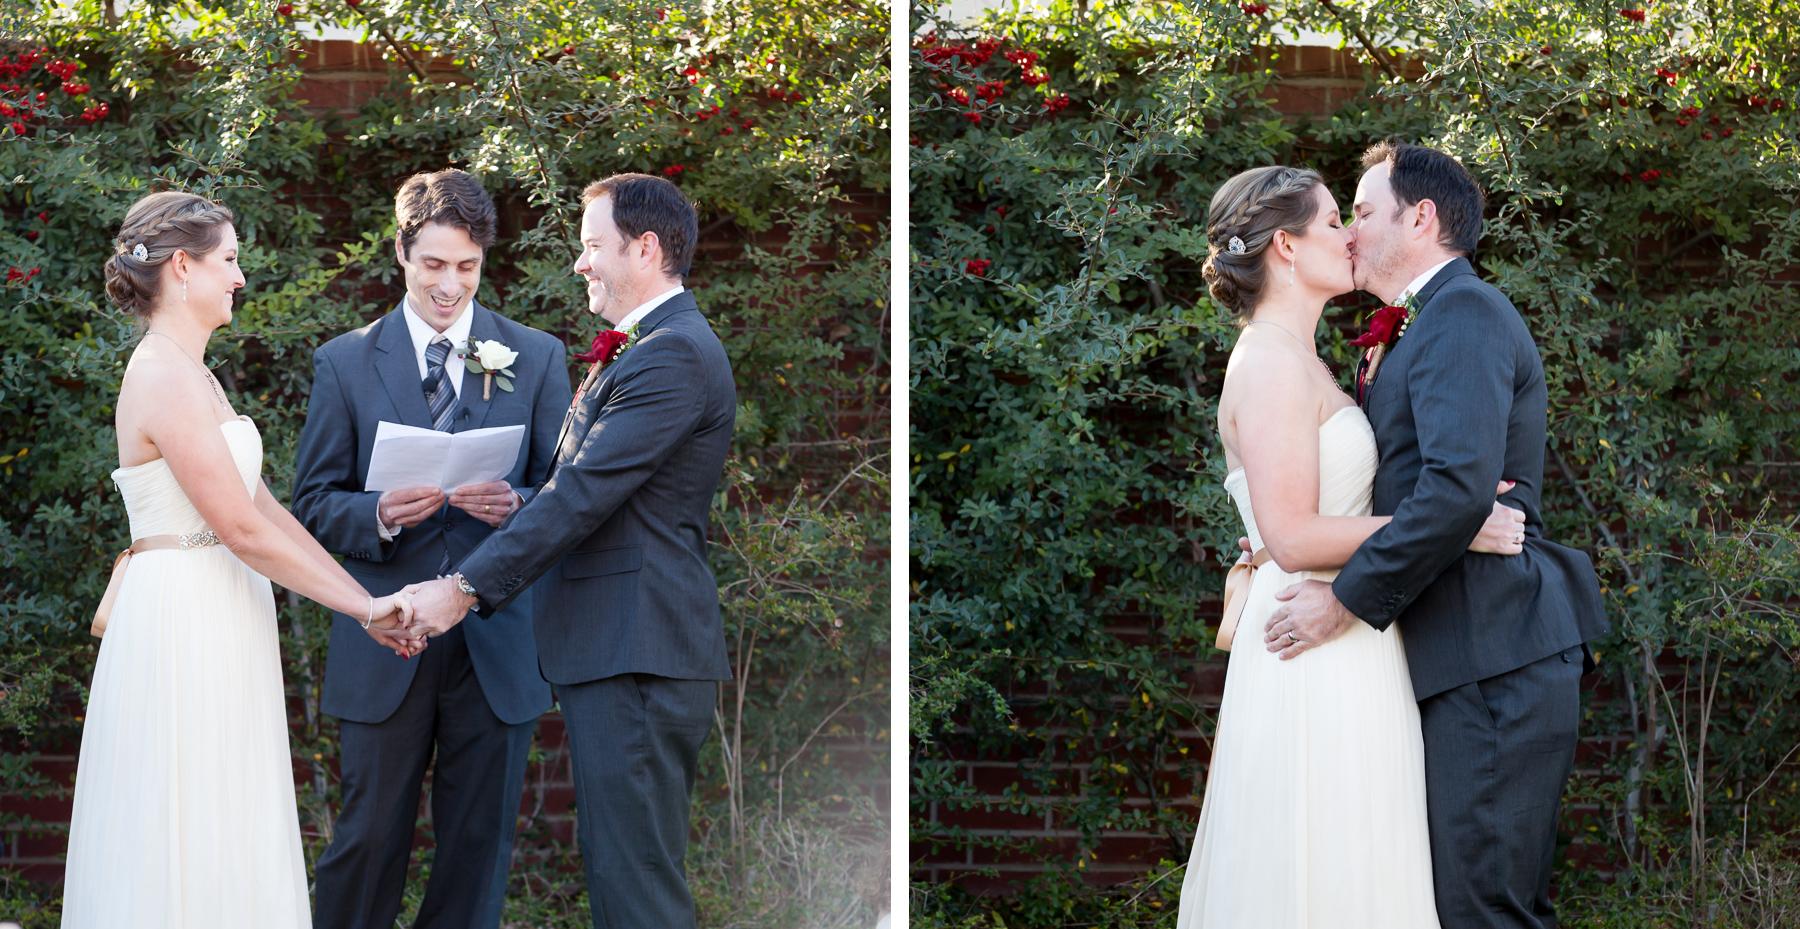 wedding-photographers-austin.jpg